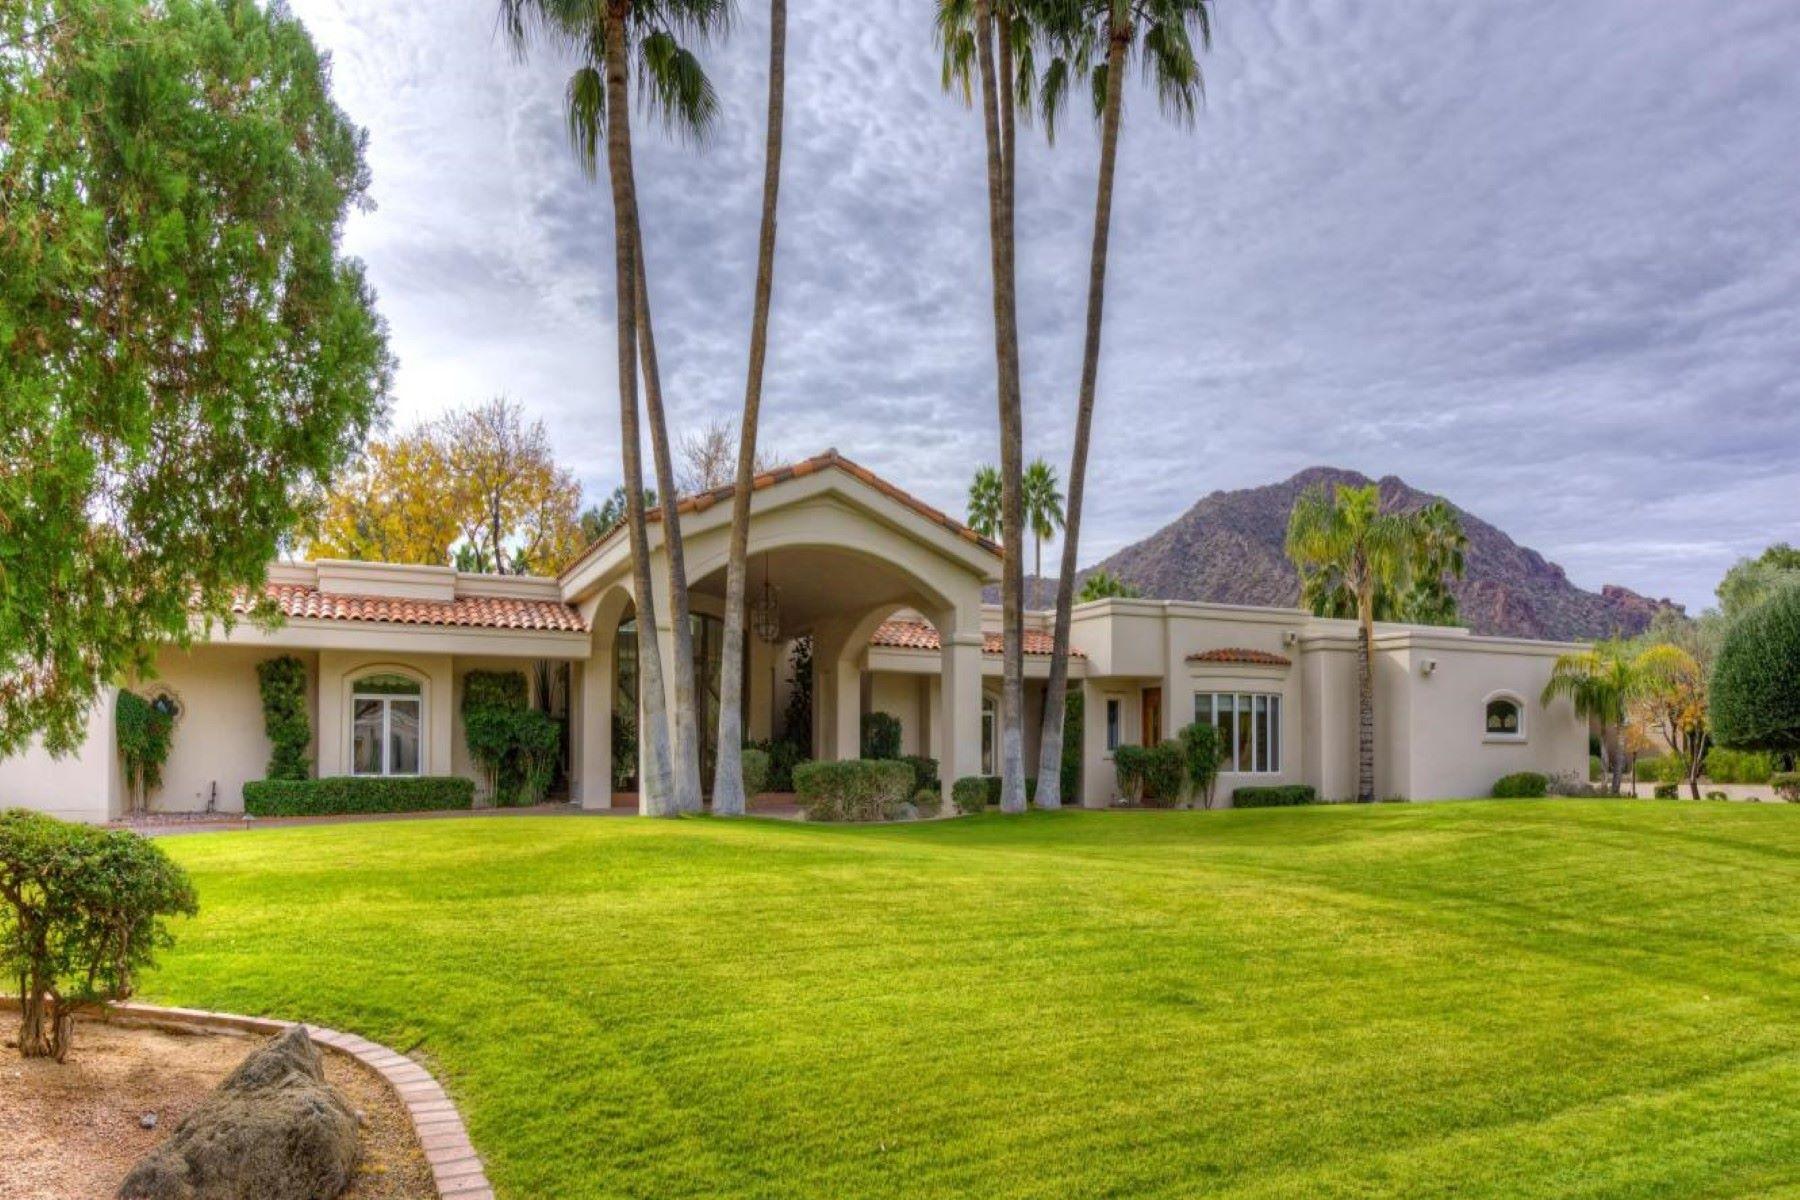 Частный односемейный дом для того Продажа на Incredible Ranch Home in Finisterre 6231 E Naumann Dr, Paradise Valley, Аризона, 85253 Соединенные Штаты